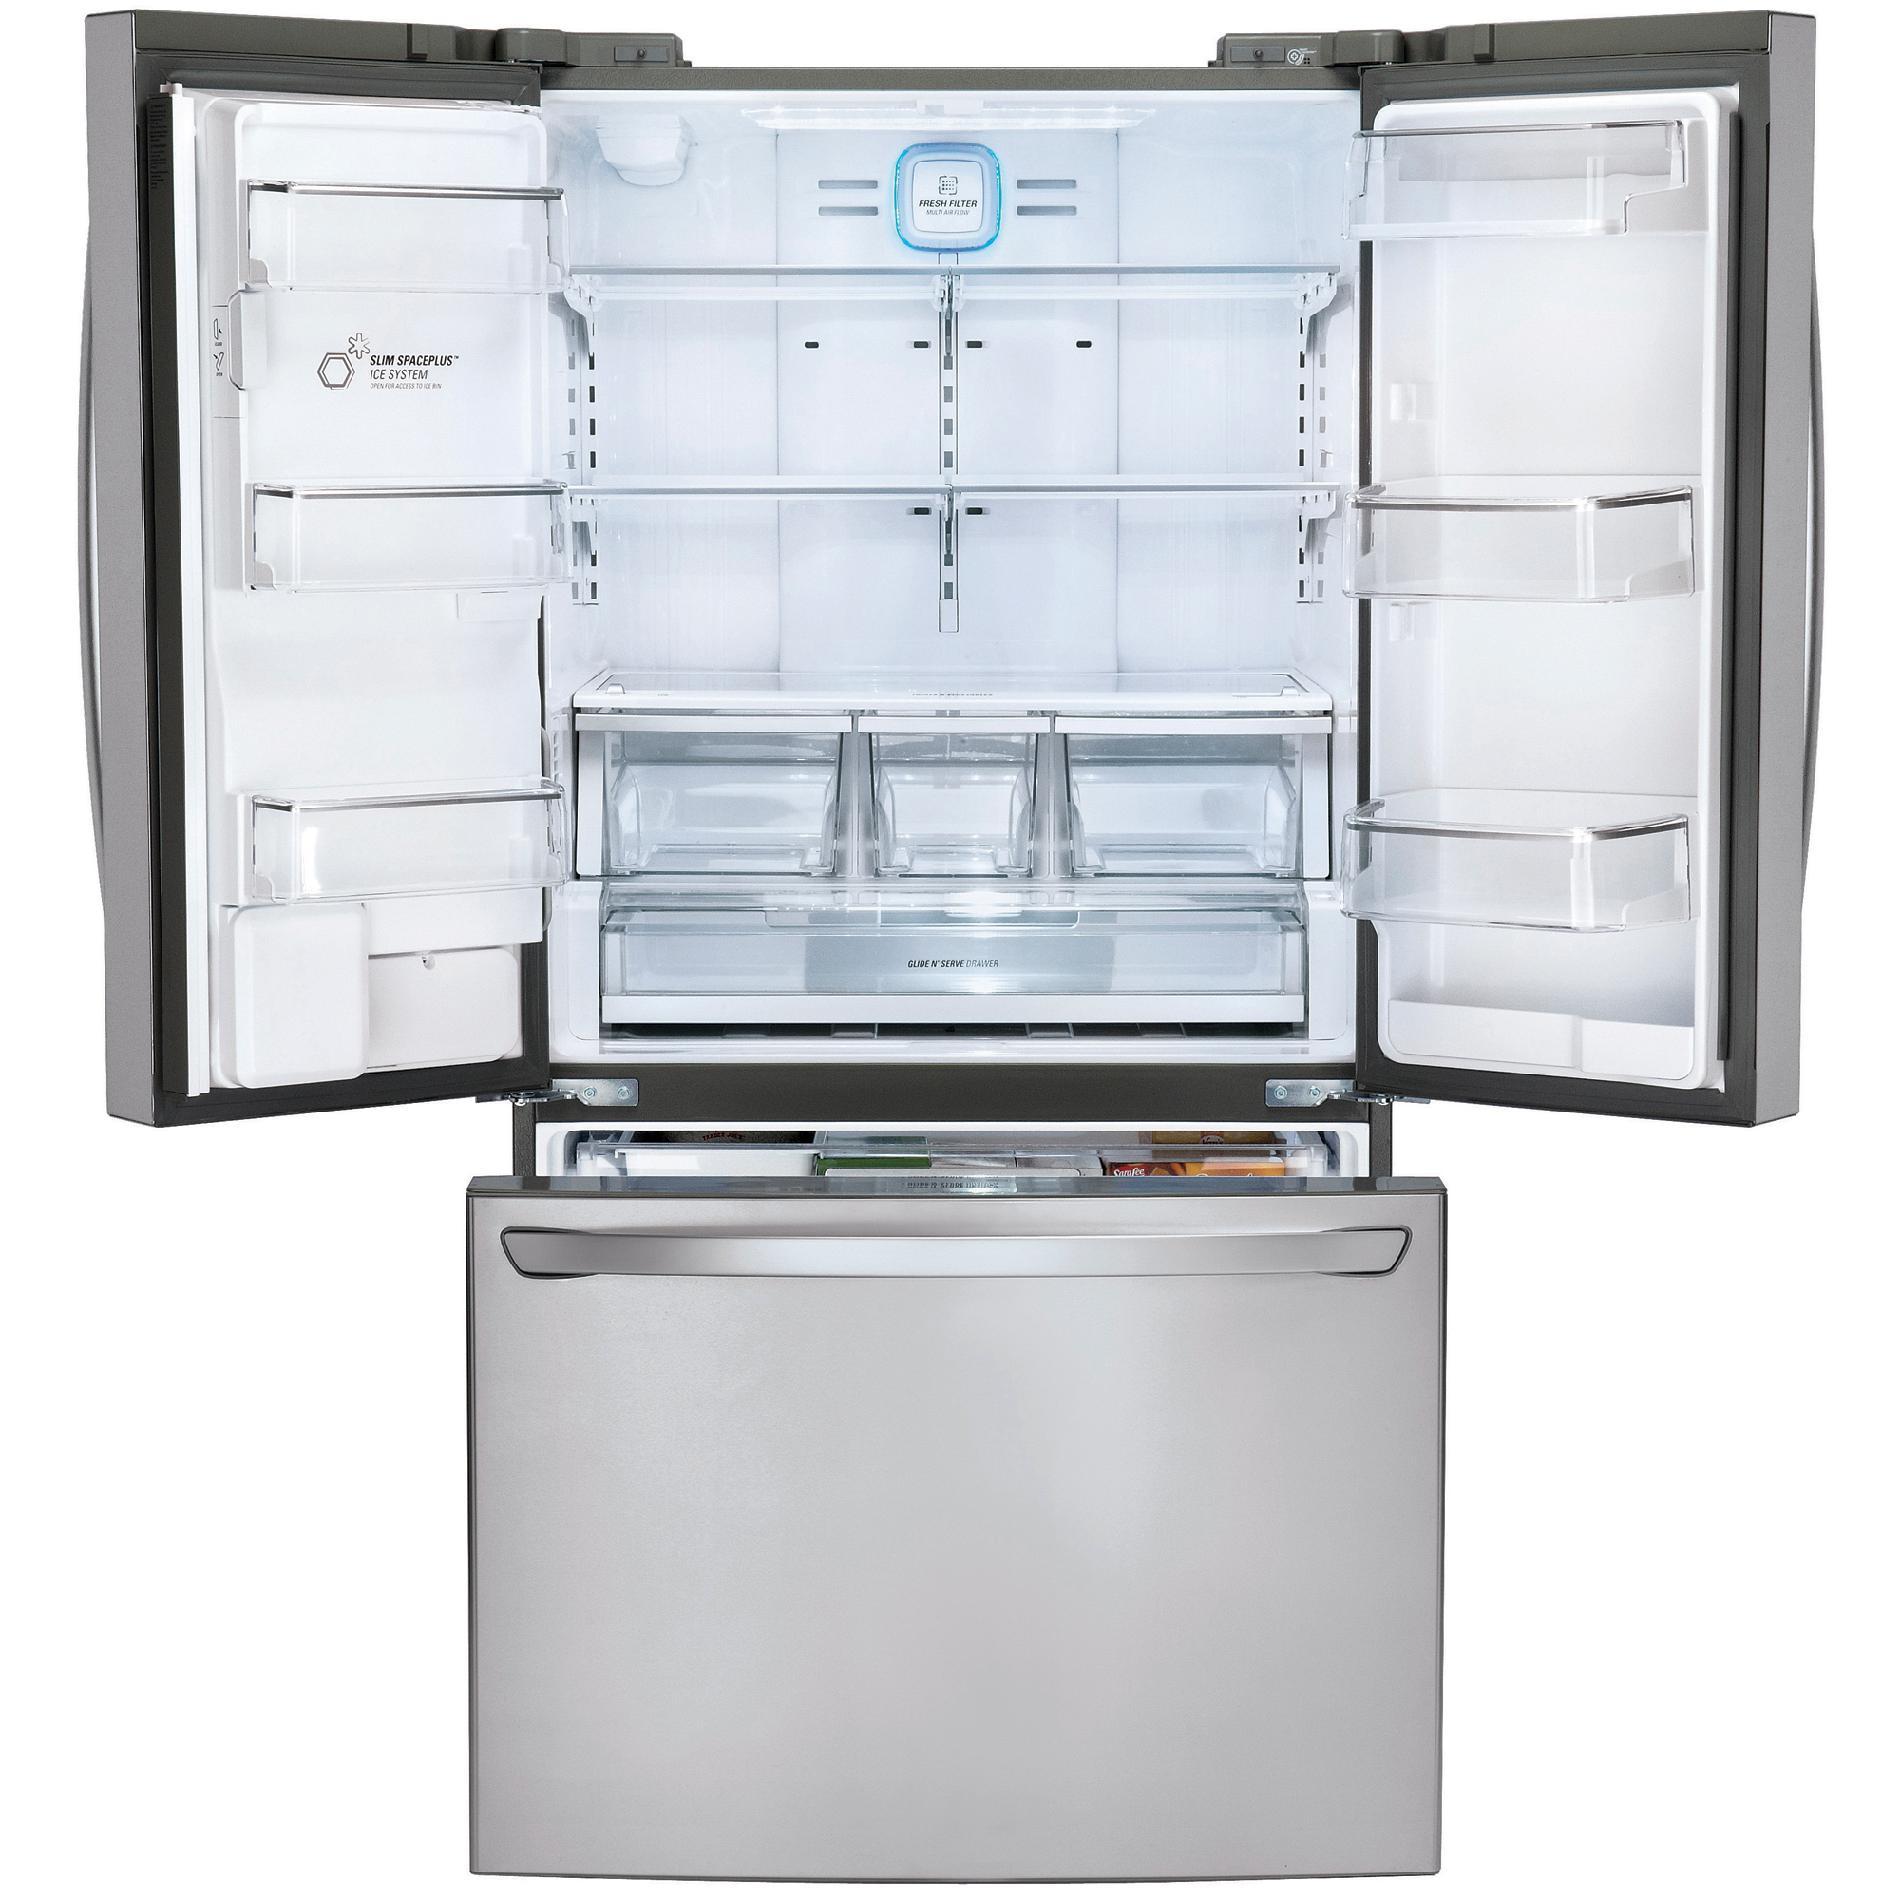 LG LFXC24726S 23.7 cu. ft. French Door Refrigerator w/Smart Cooling Plus